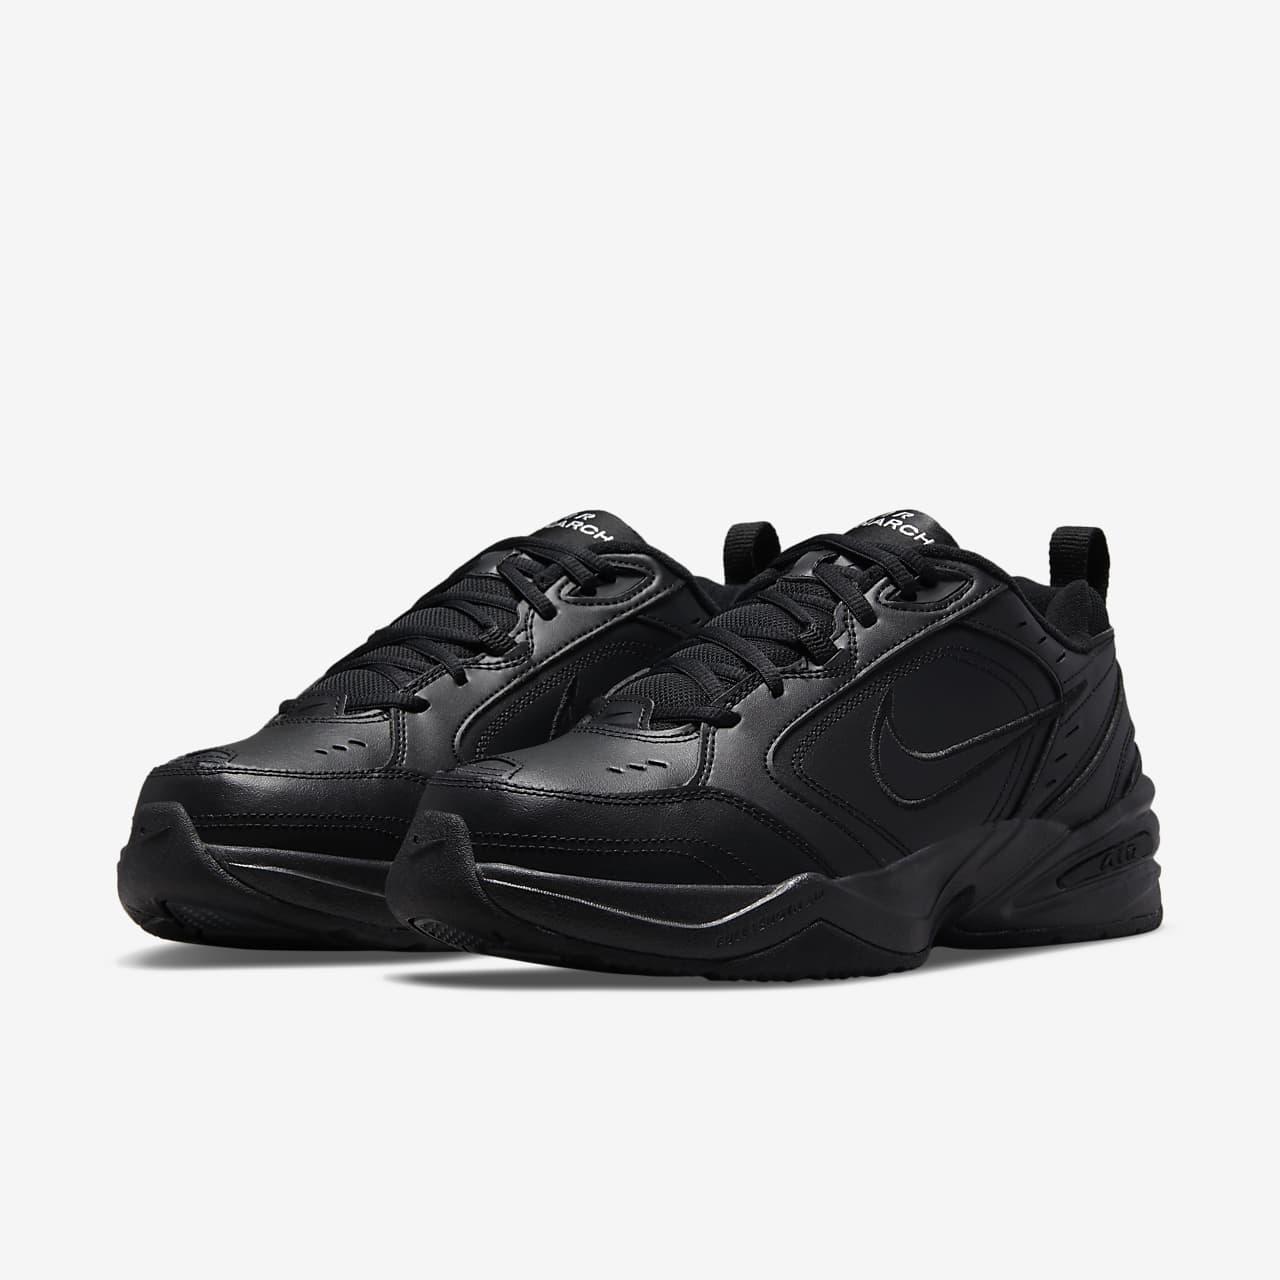 nike air monarch black on feet